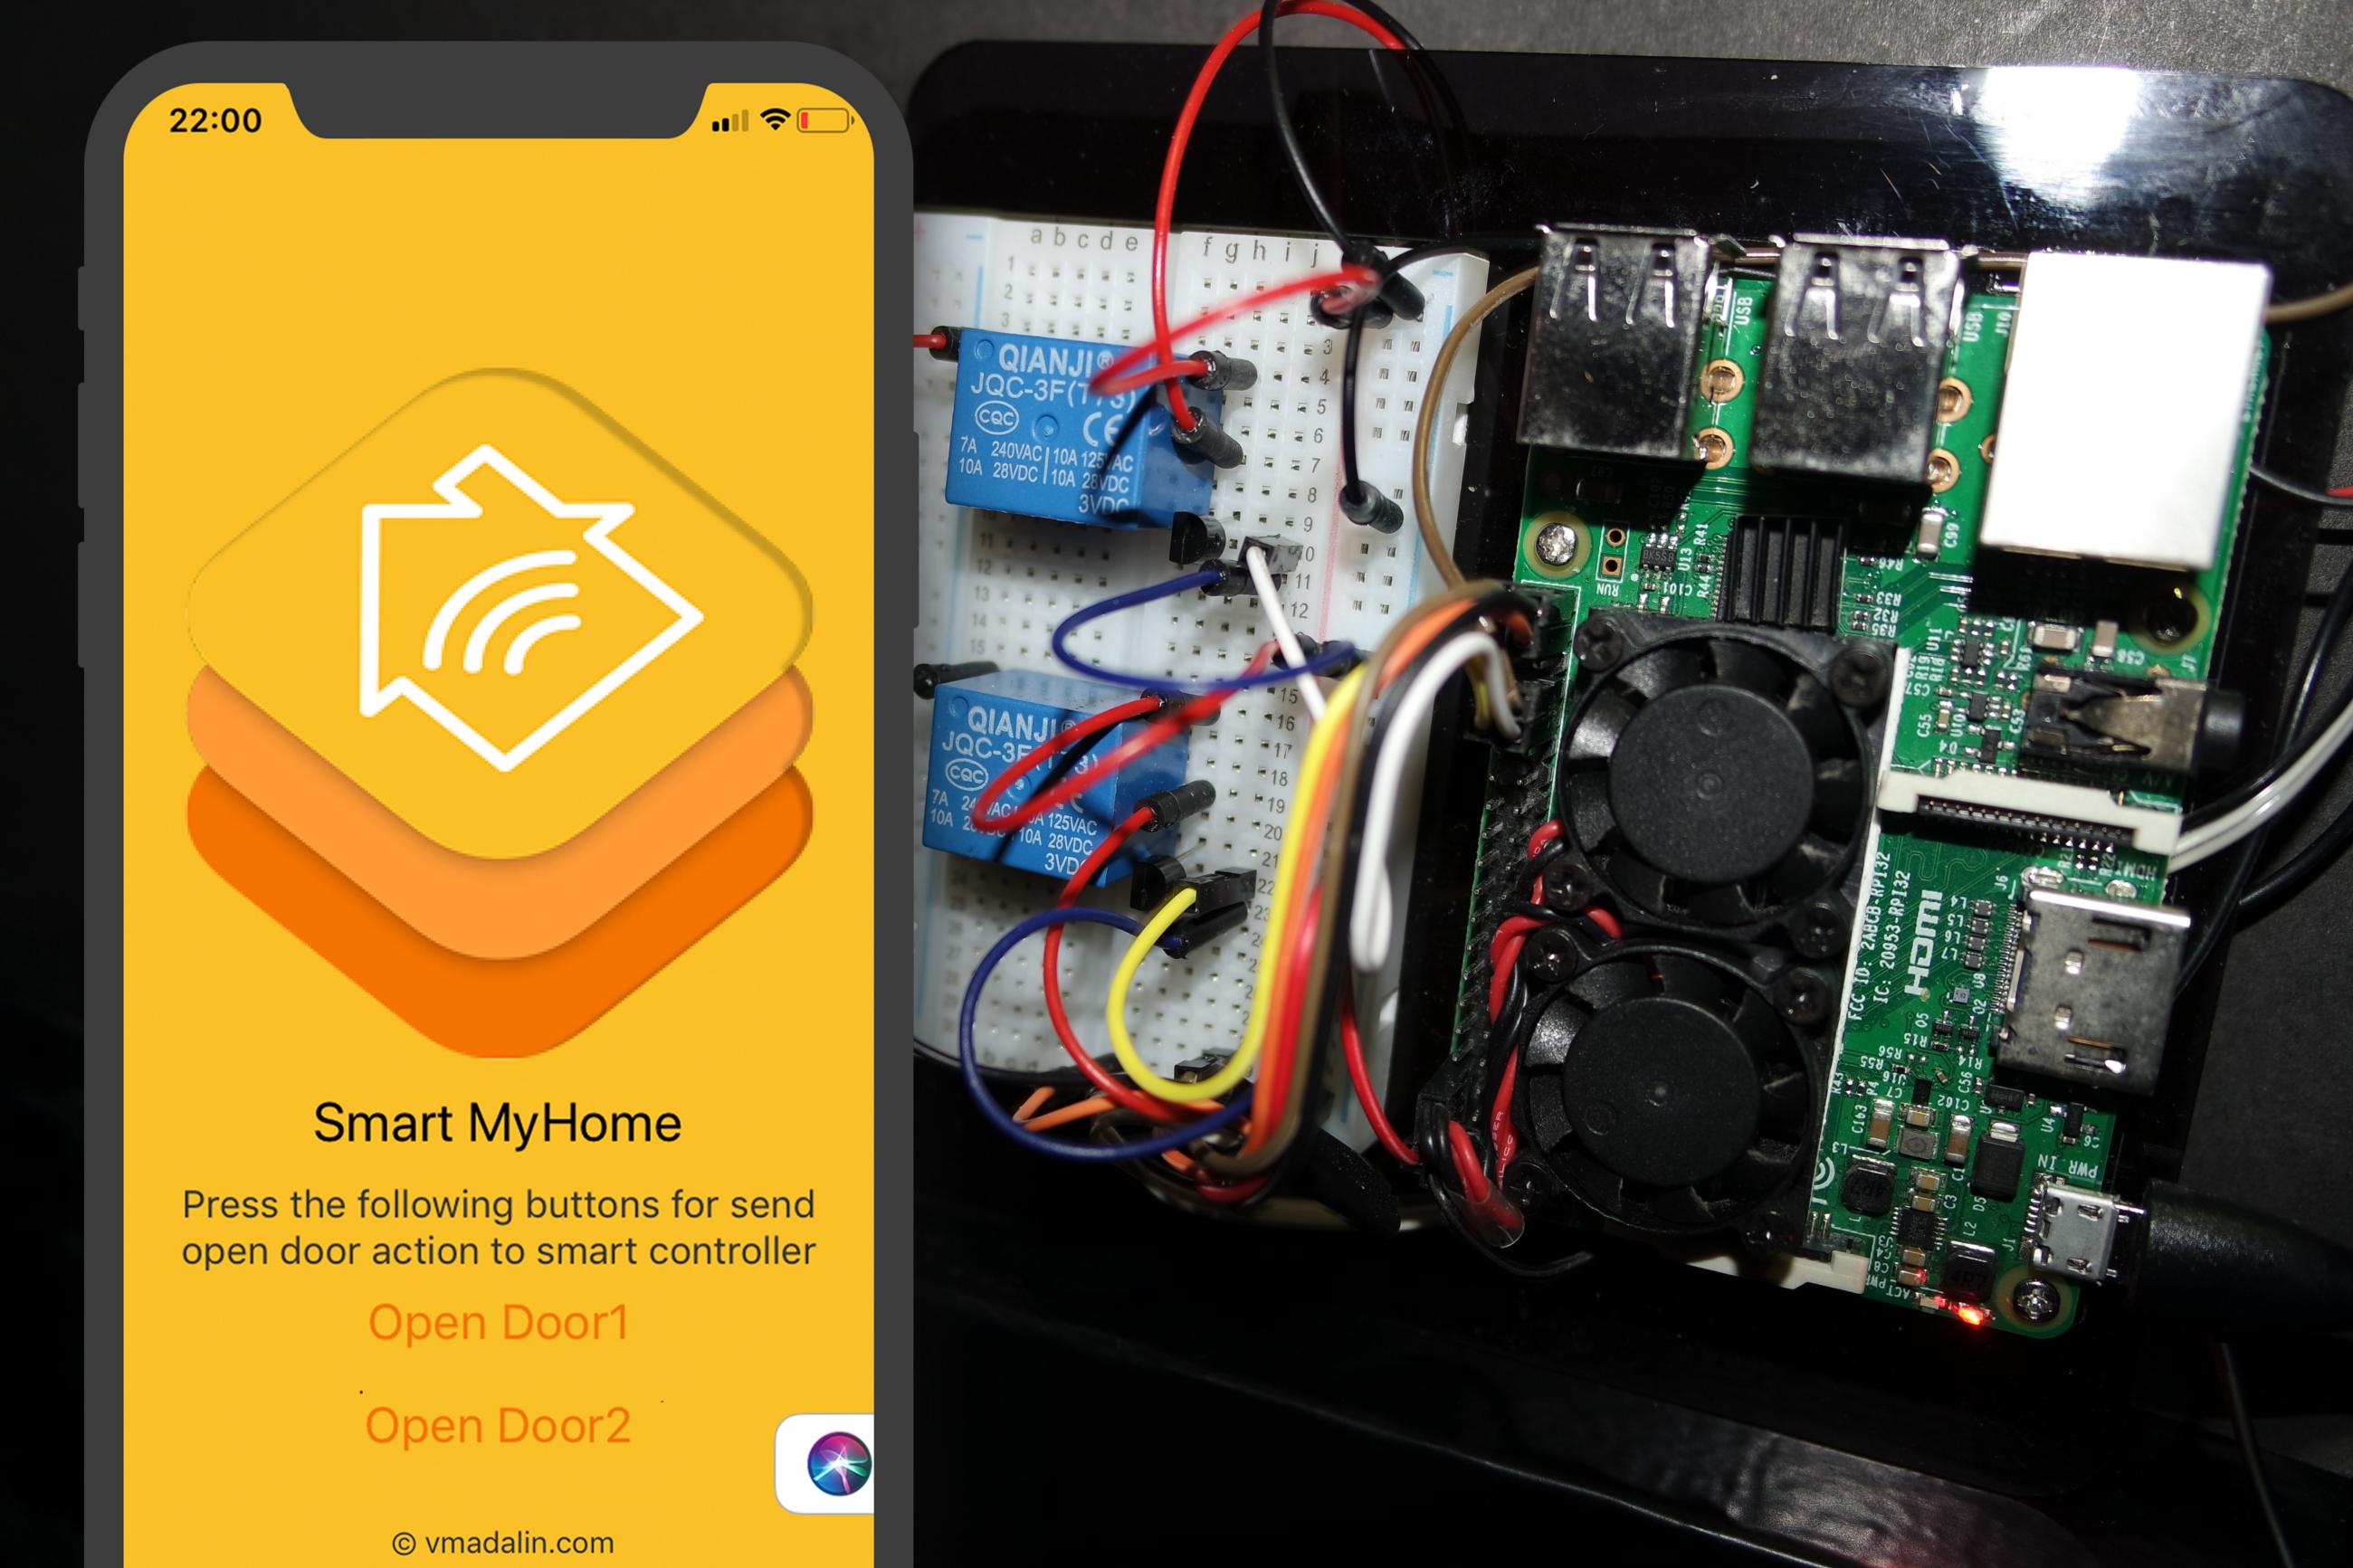 /my-smart-home-2bfc9da635c1 feature image